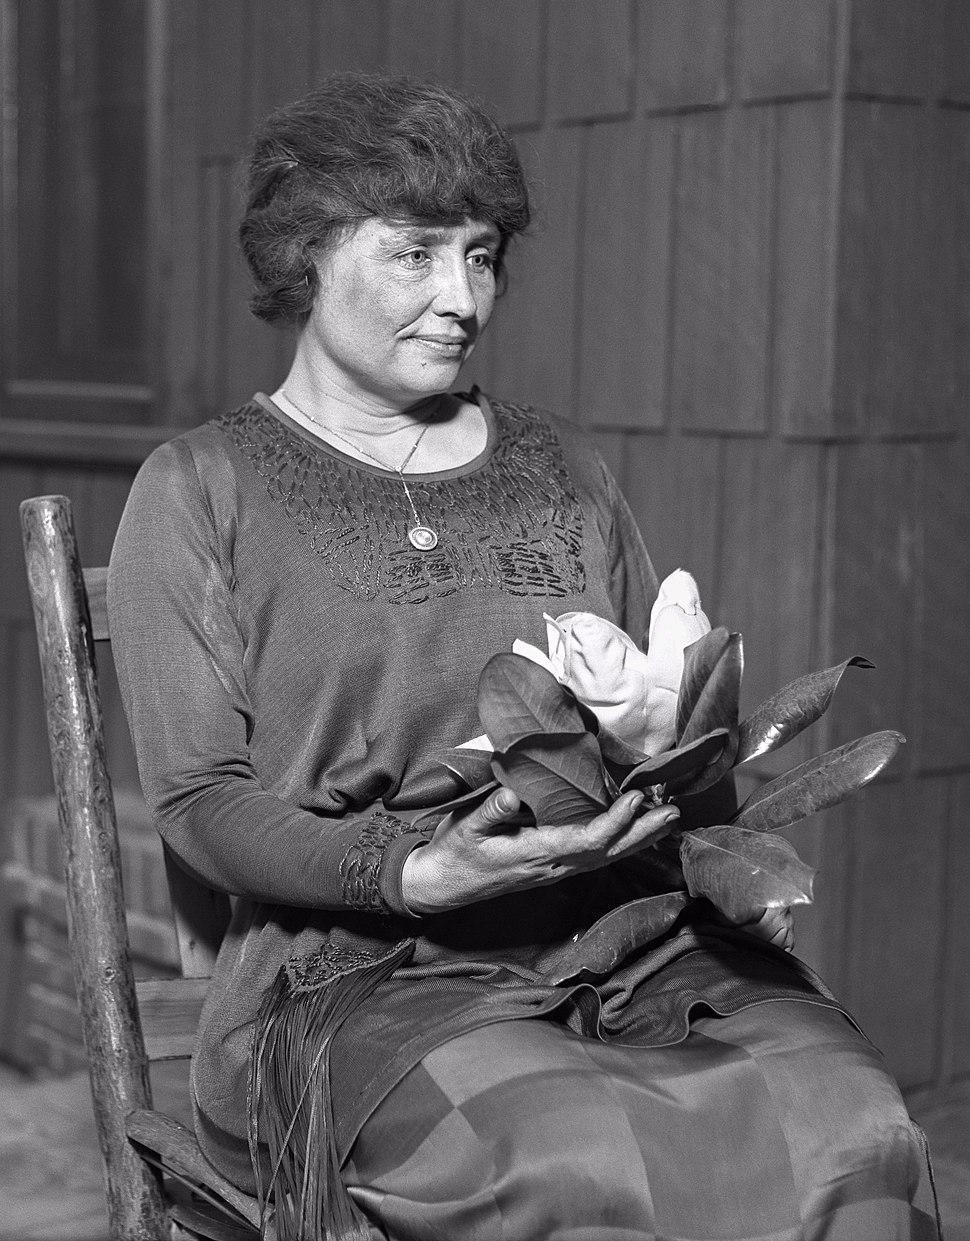 Helen Keller circa 1920 - restored